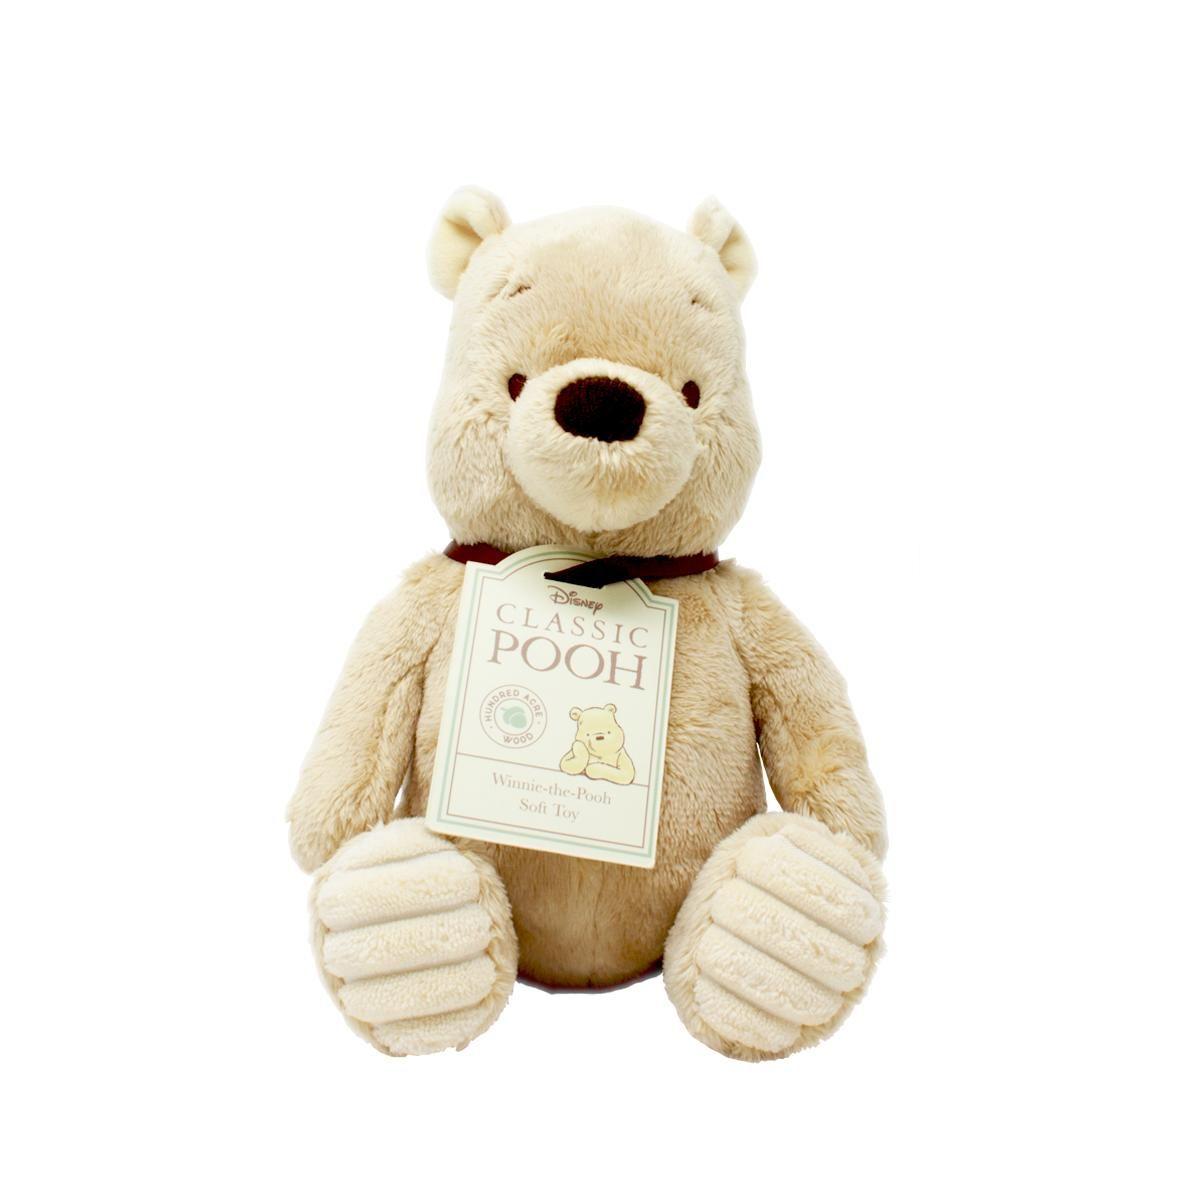 Classic Winnie the Pooh 20cm Soft Toy by Rainbow Designs DN1460